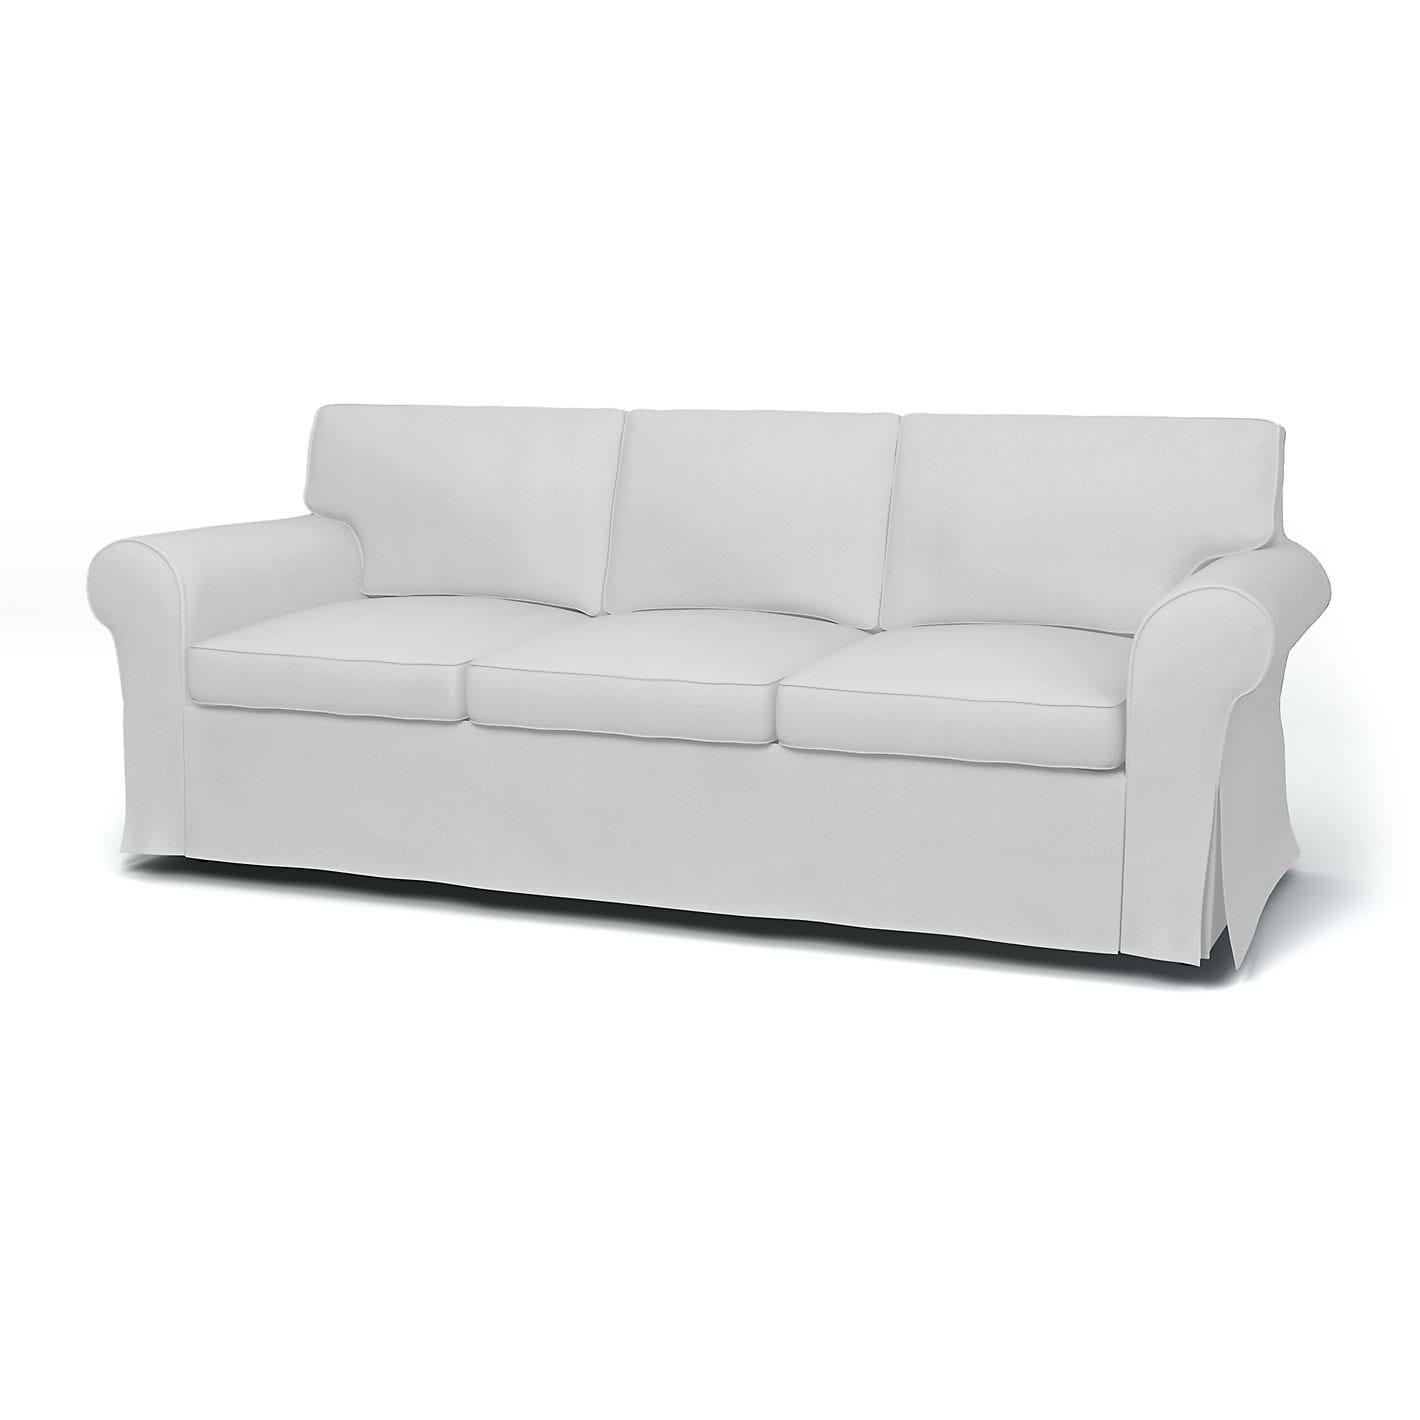 Fabulous Sofabezuge Fur Ikea Couches Bemz Uwap Interior Chair Design Uwaporg